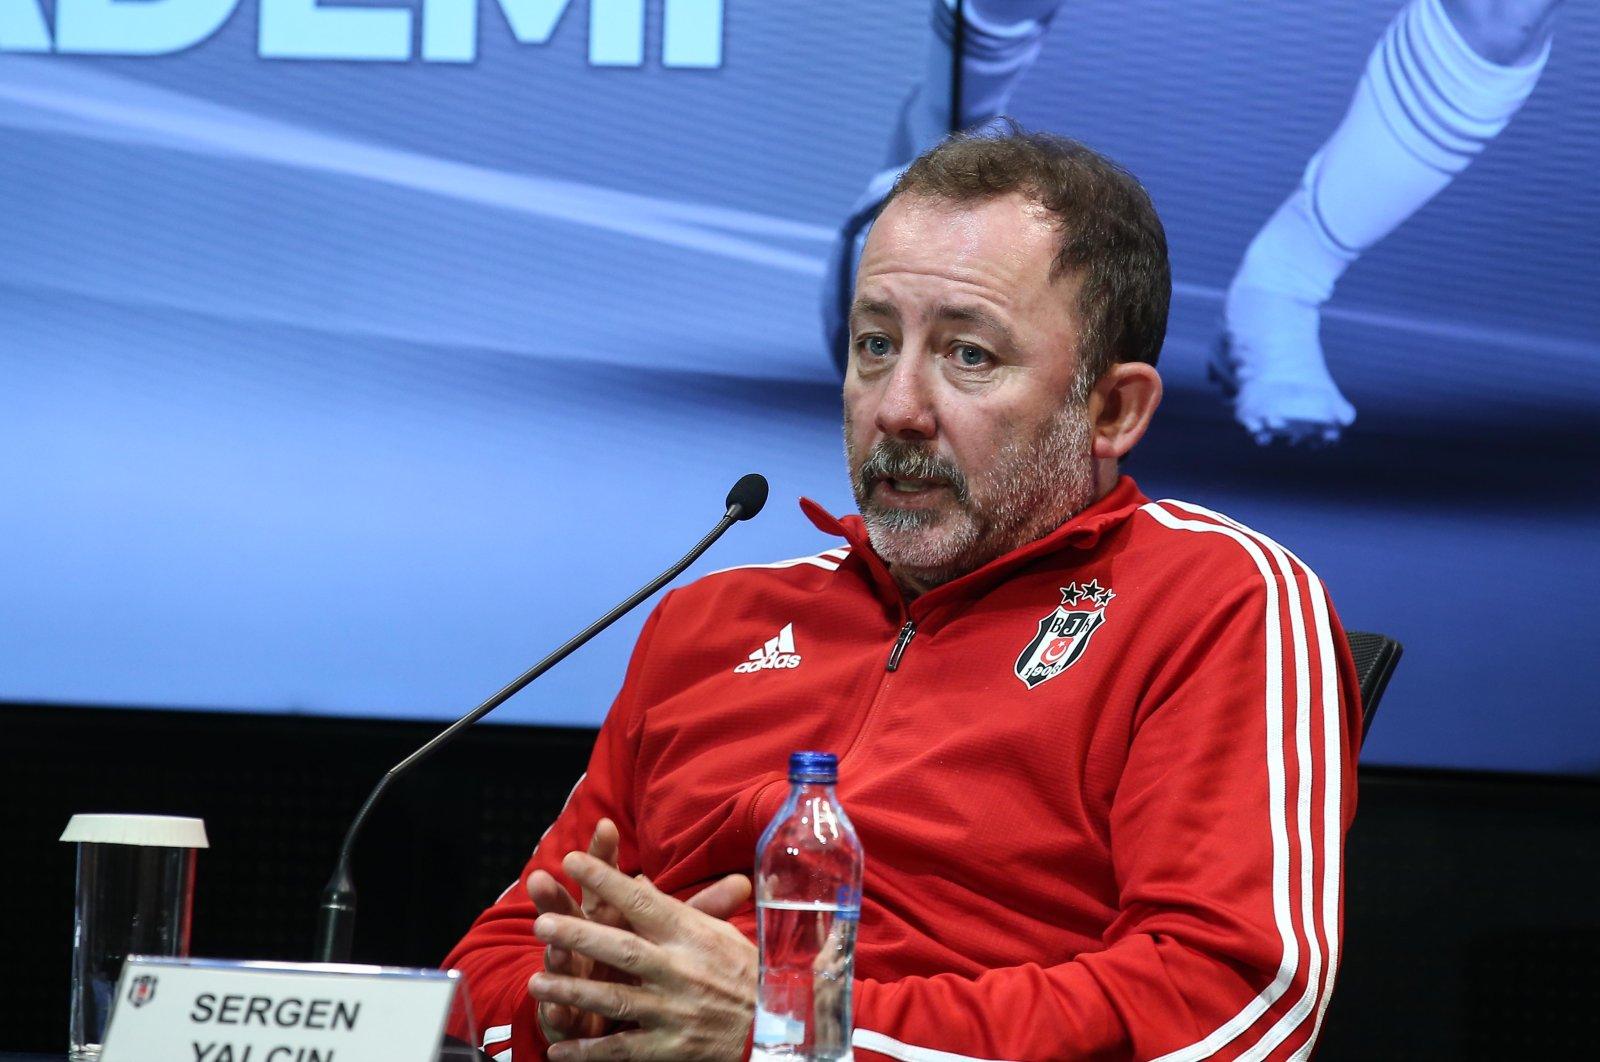 Beşiktaş coach Sergen Yalçın speaks during a news conference at Vodafone Park, Istanbul, Sept. 10, 2020. (AA Photo)